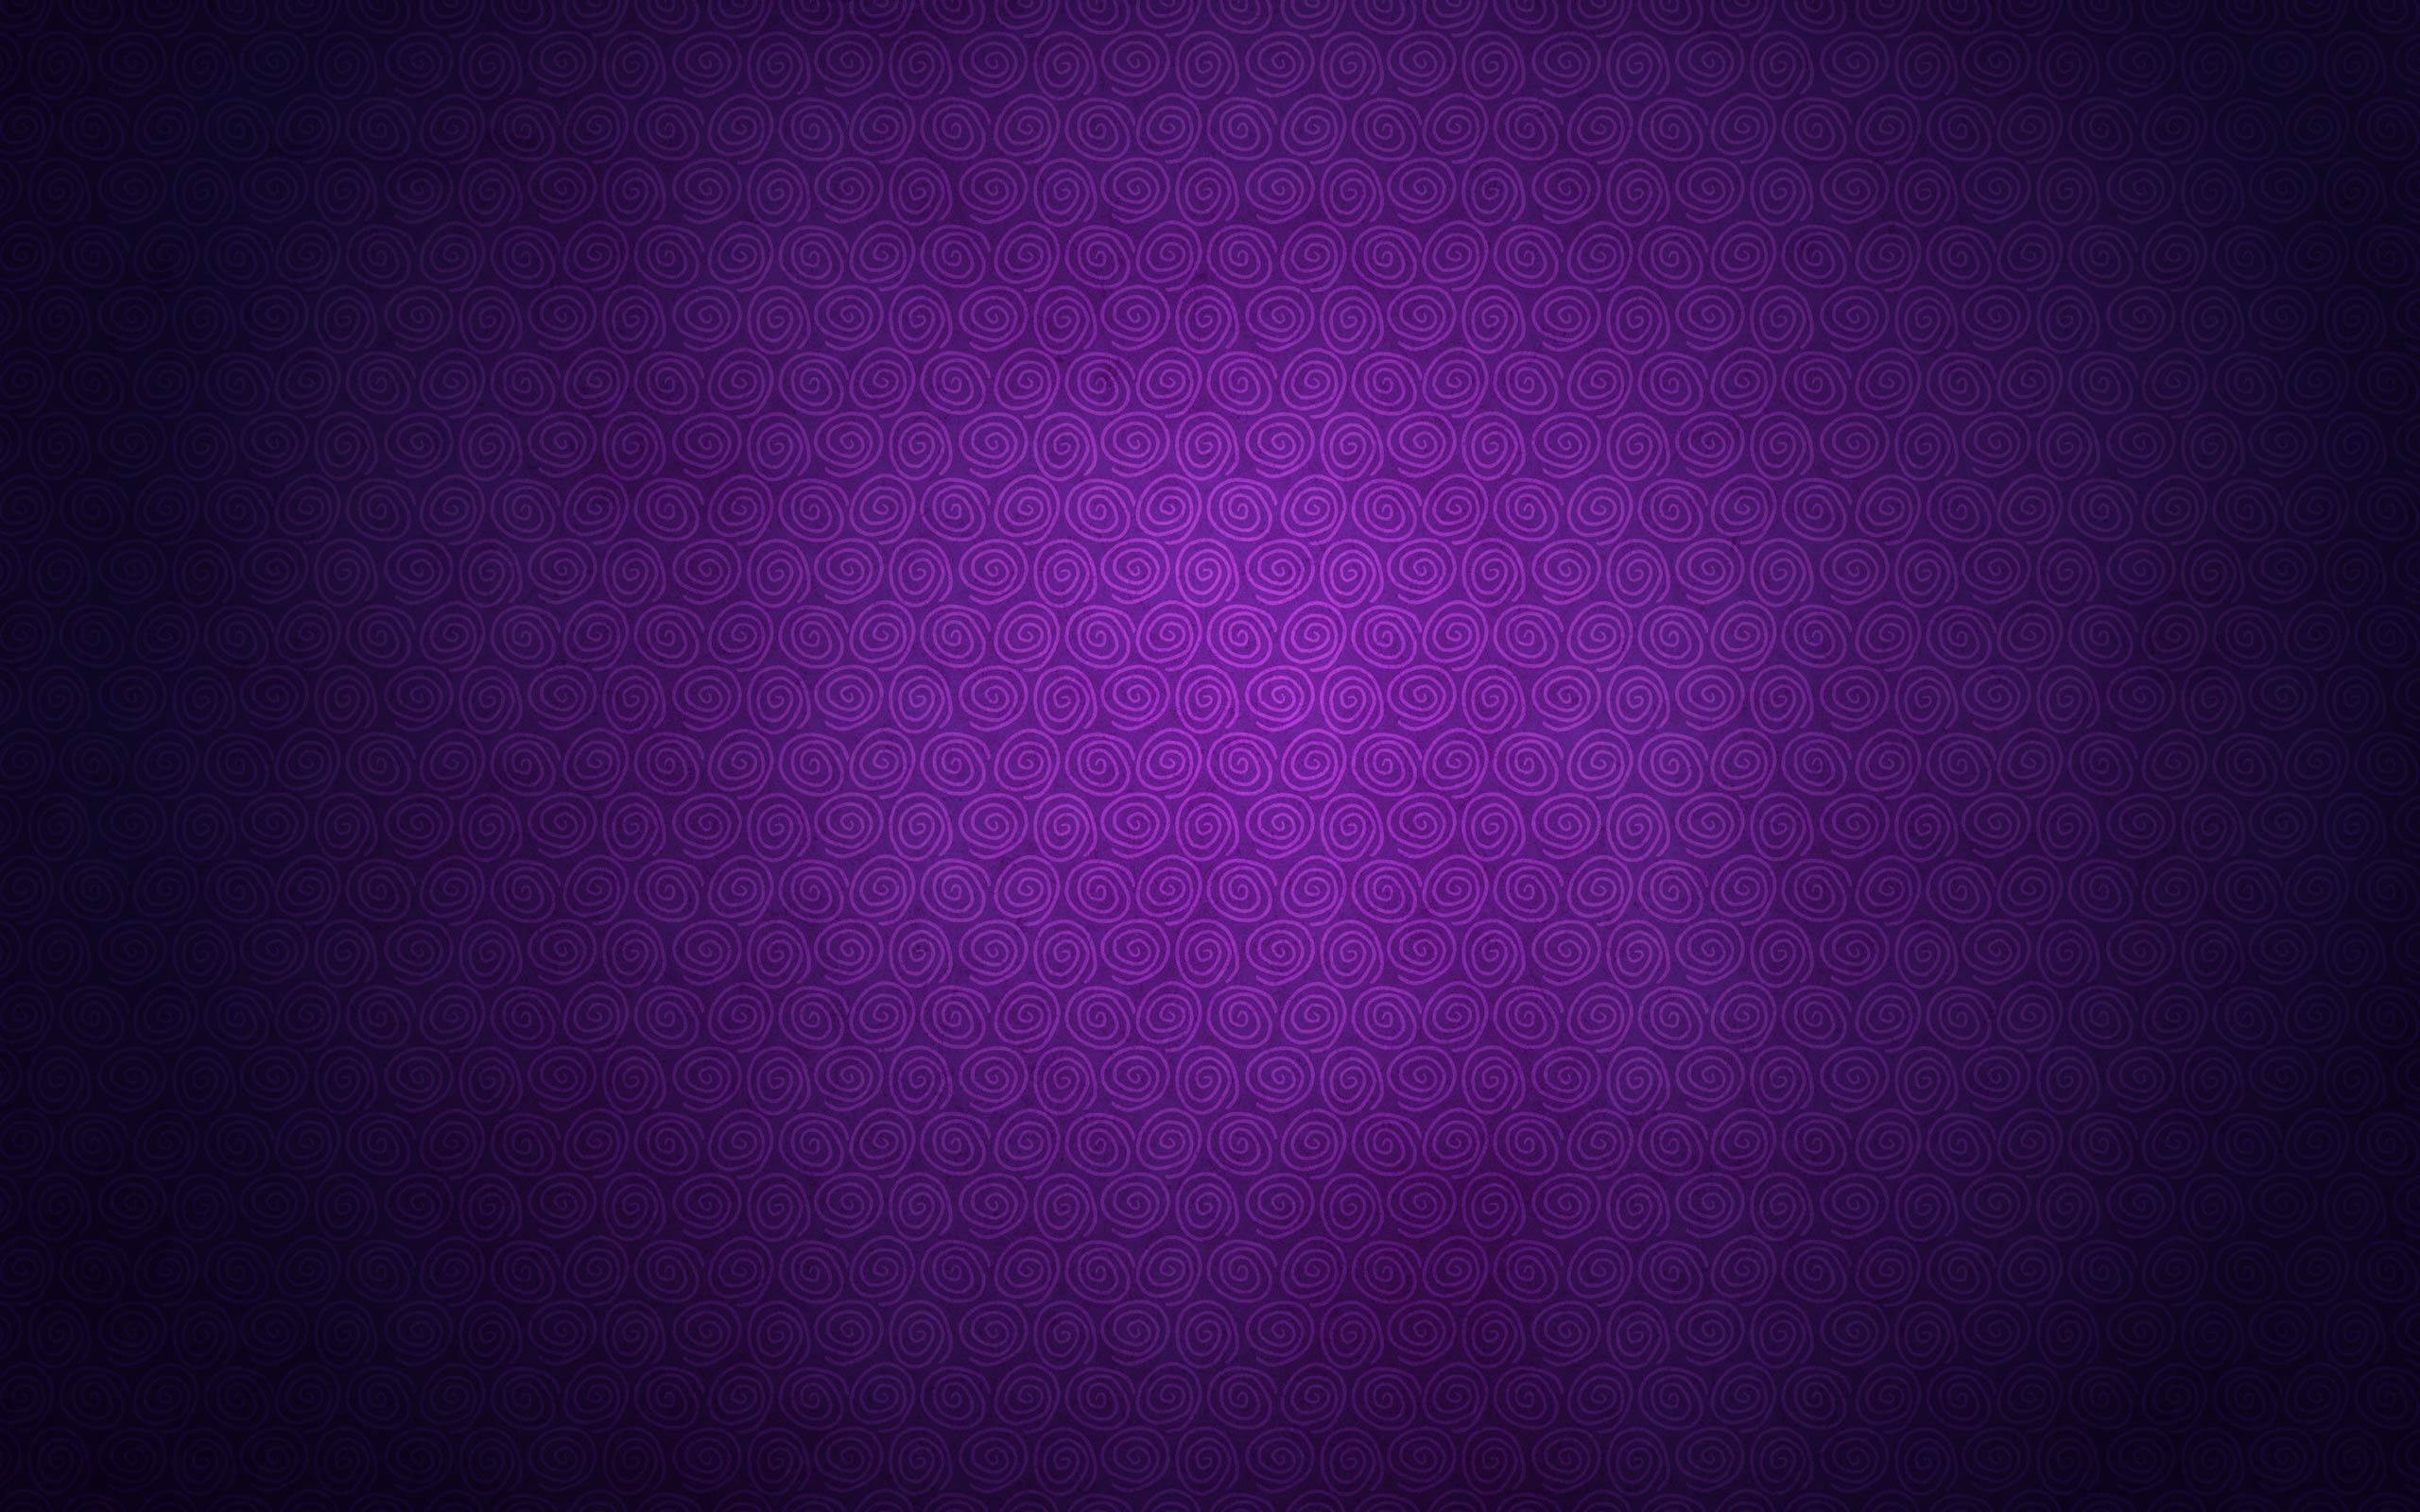 Light Purple Pattern Wallpapers Backgrounds 11928 Full HD .